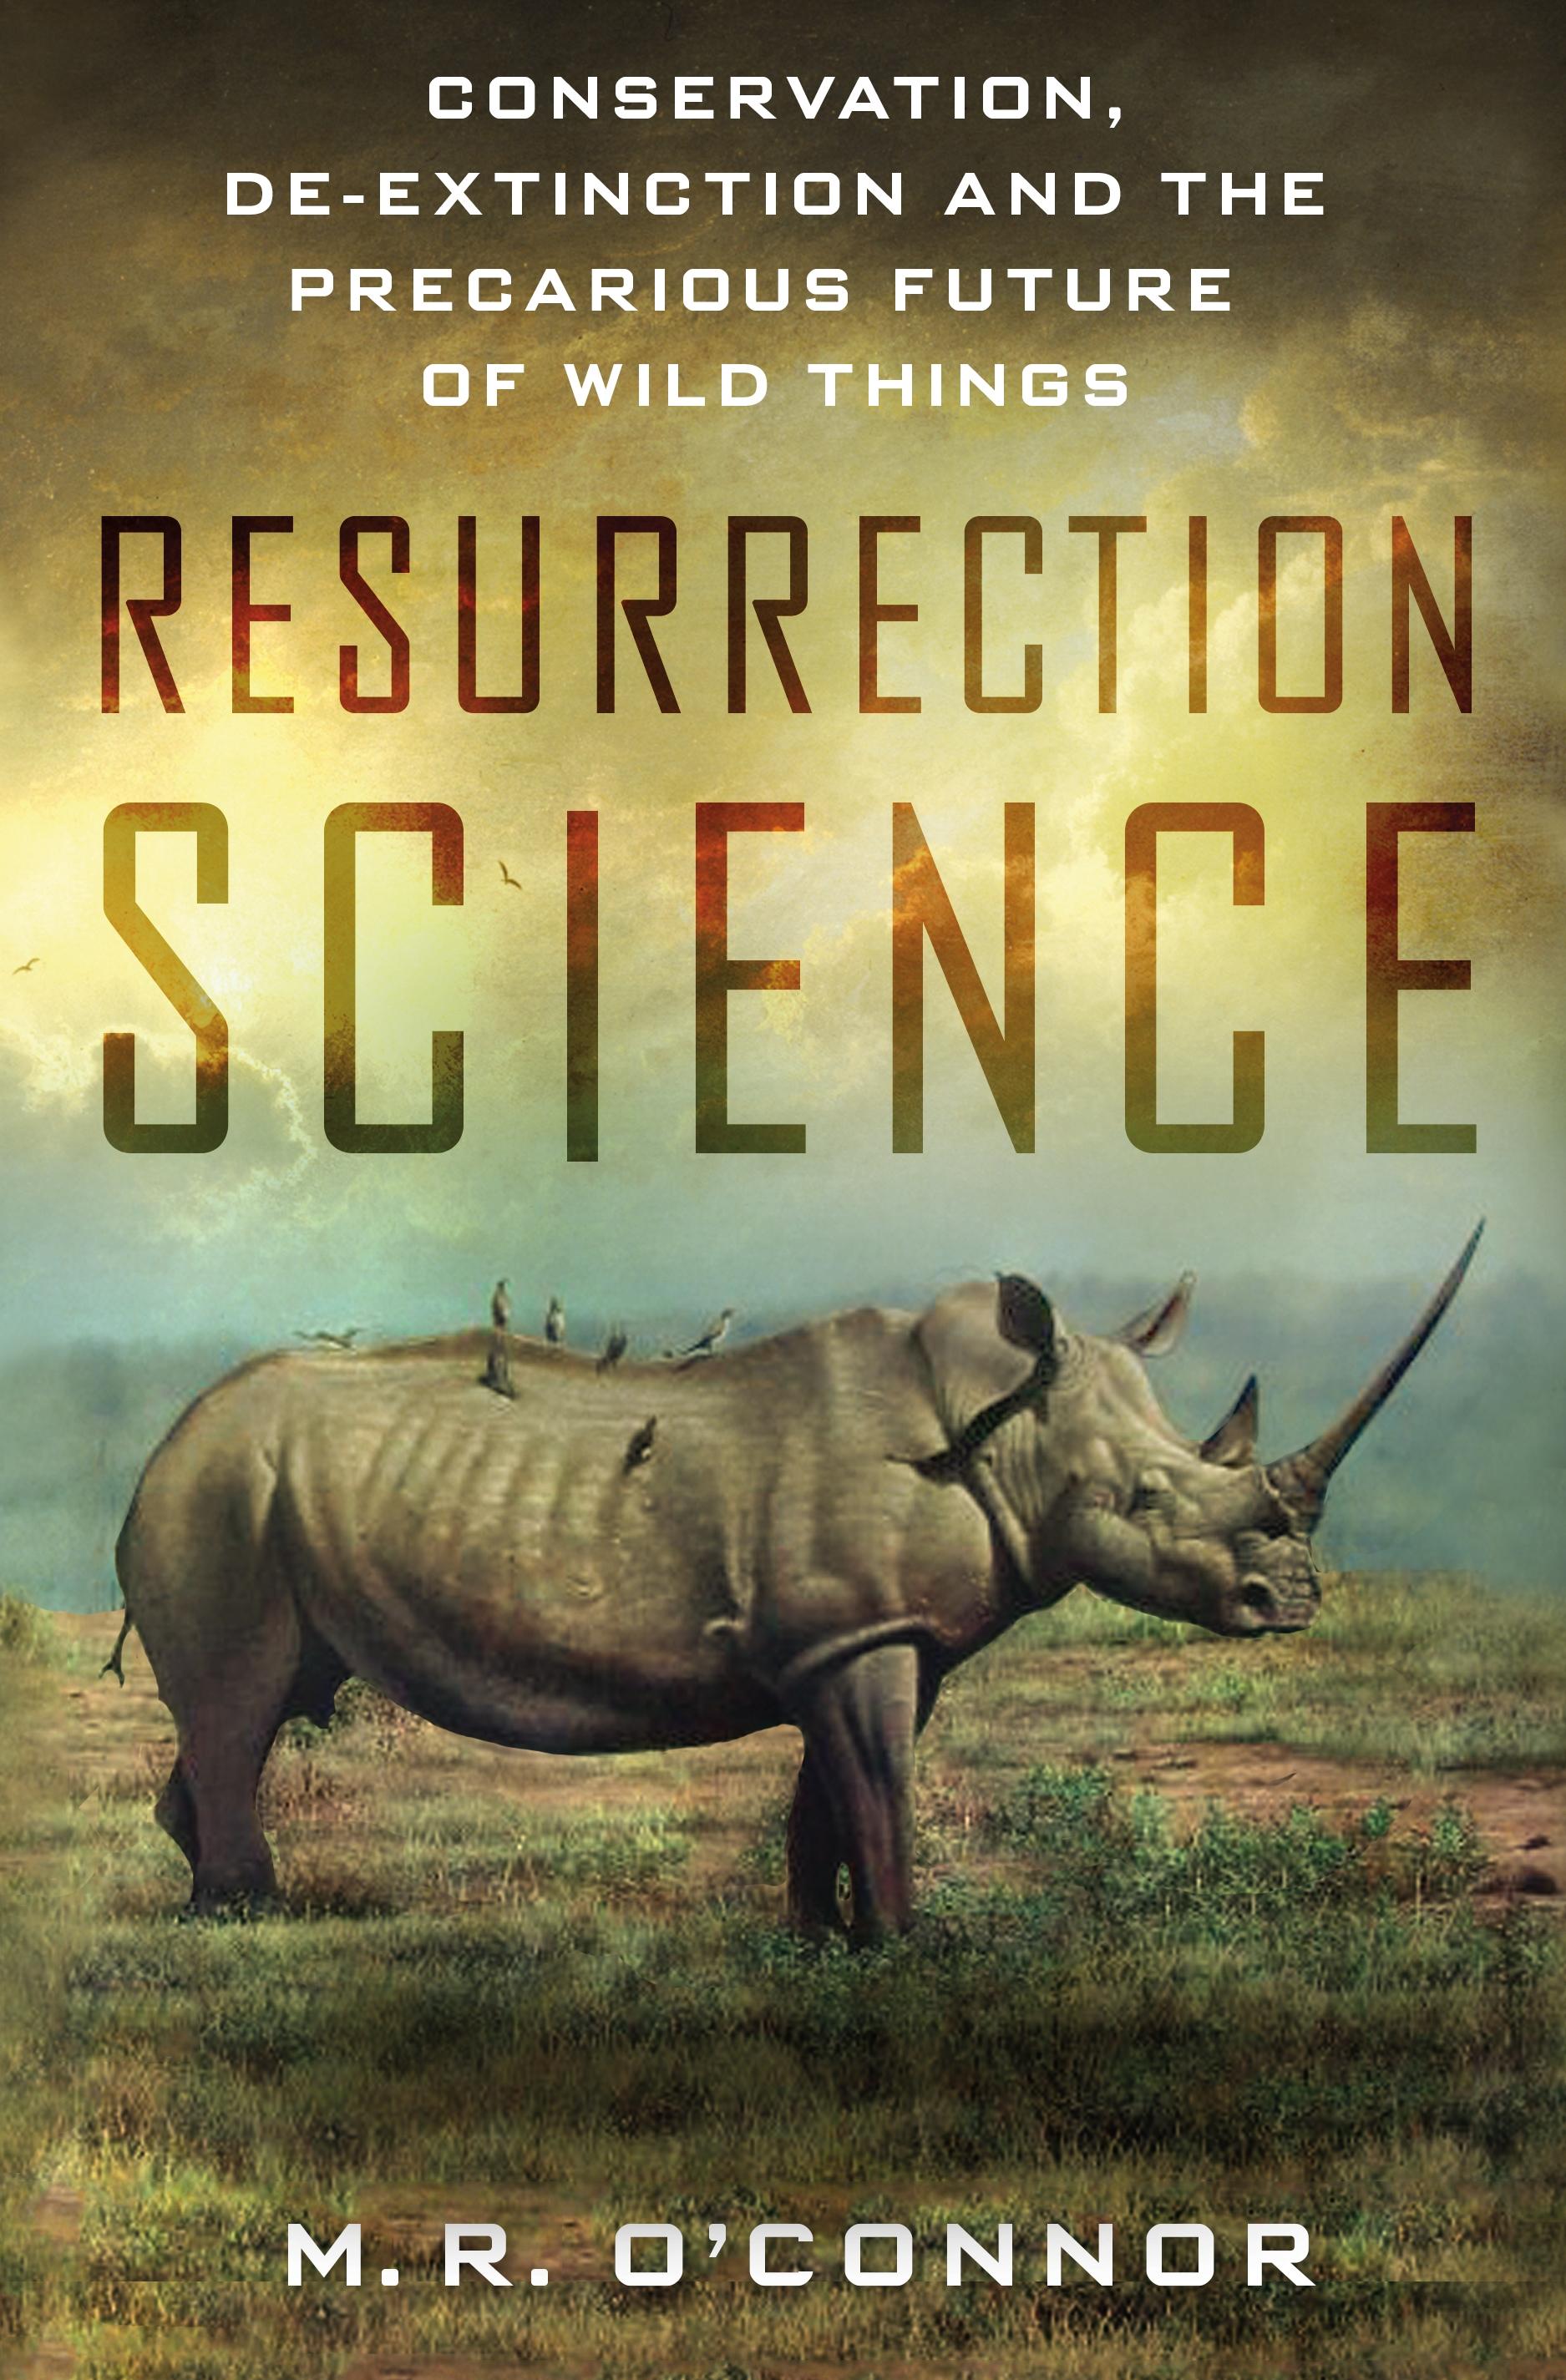 ResurrectionScience-cover.jpg